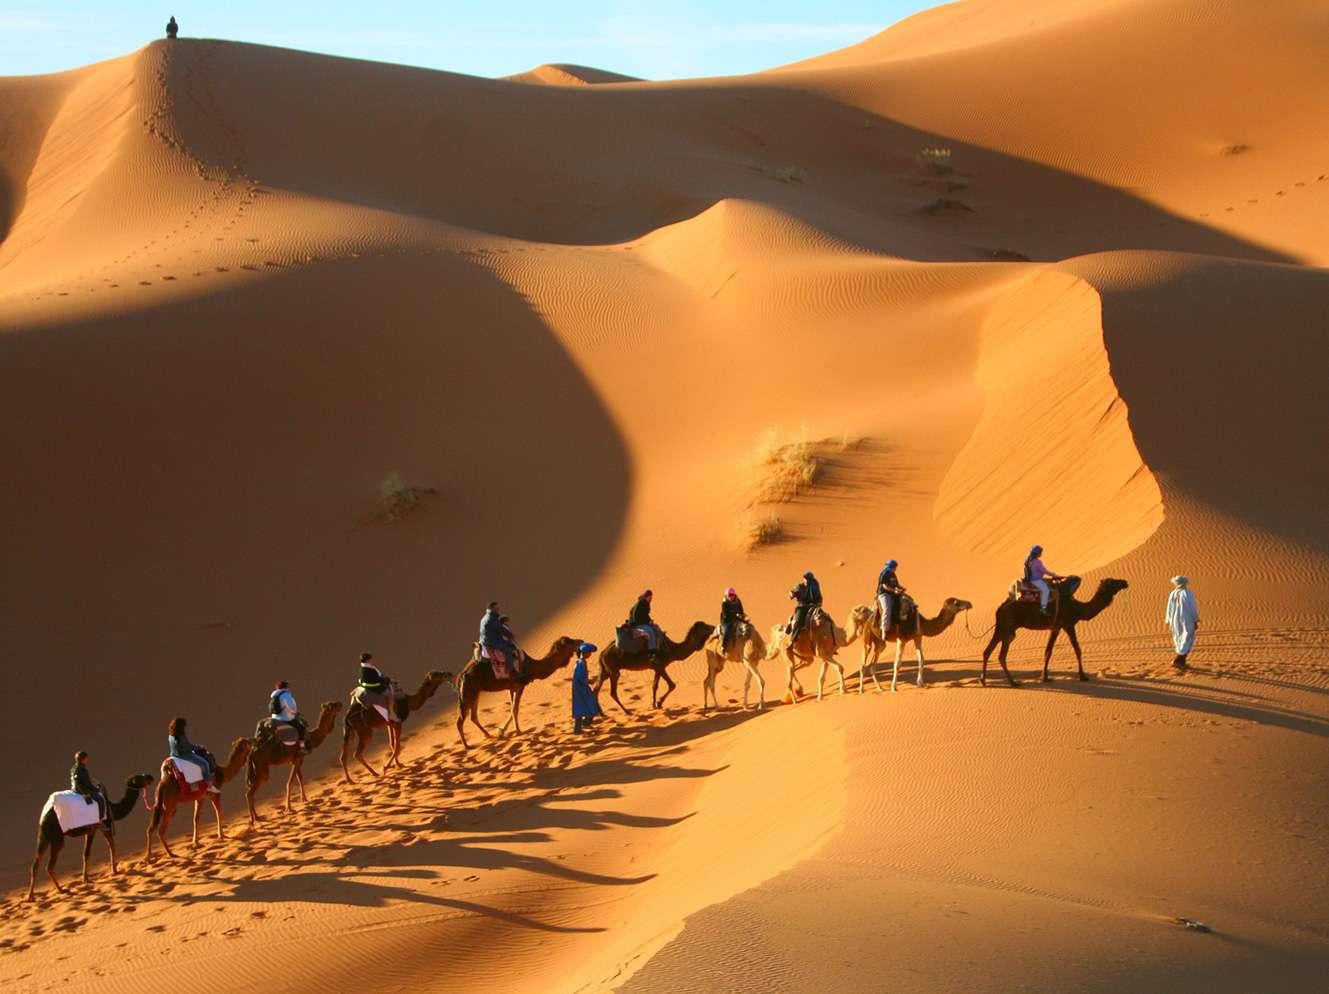 urs of Morocco, Merzouga Dunes